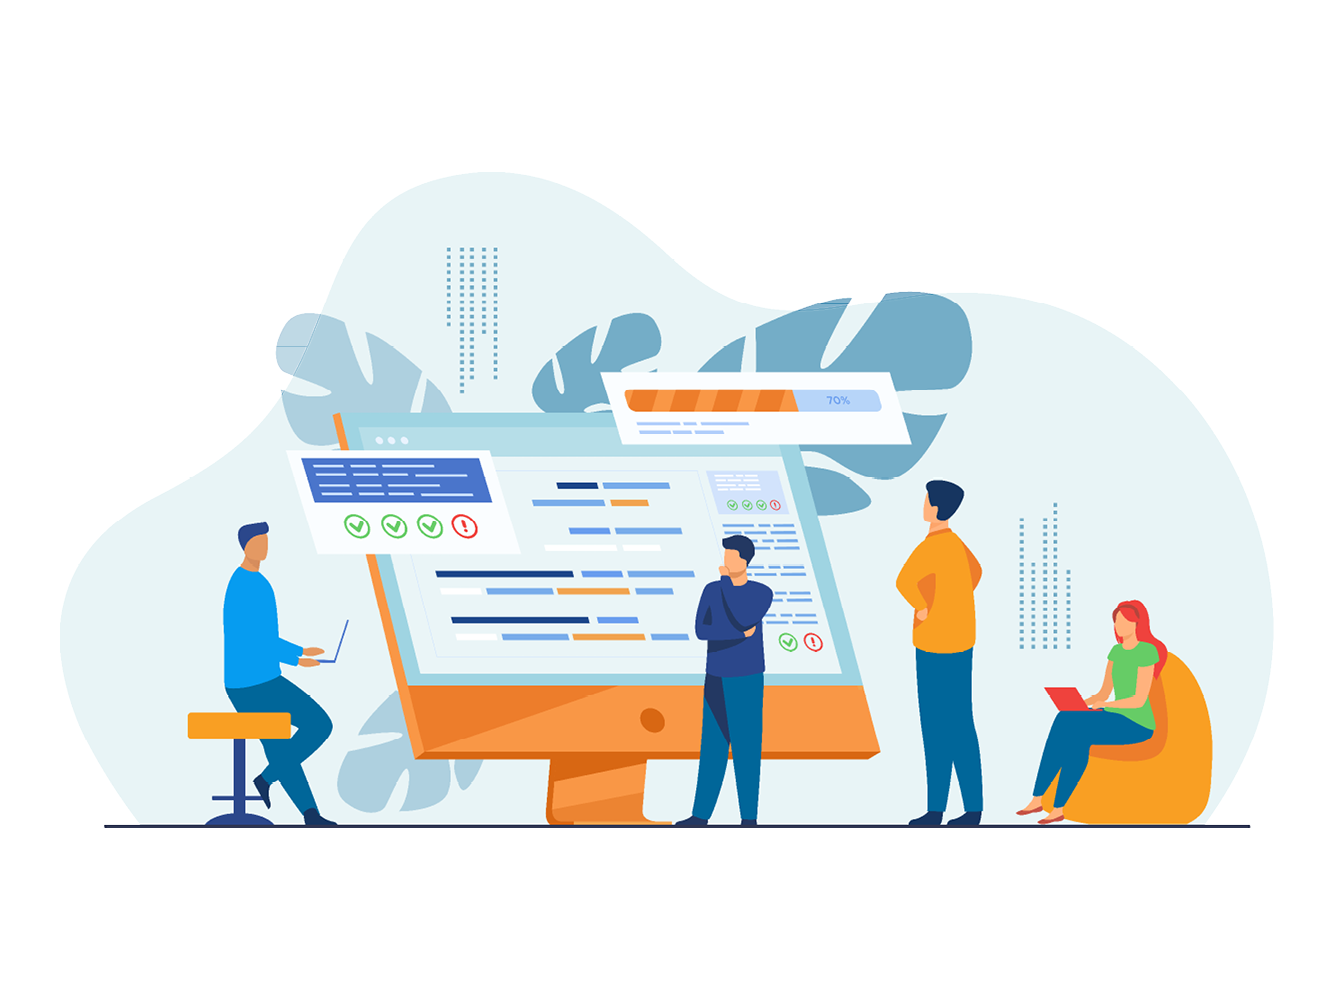 software-developers-observing-data-compliance